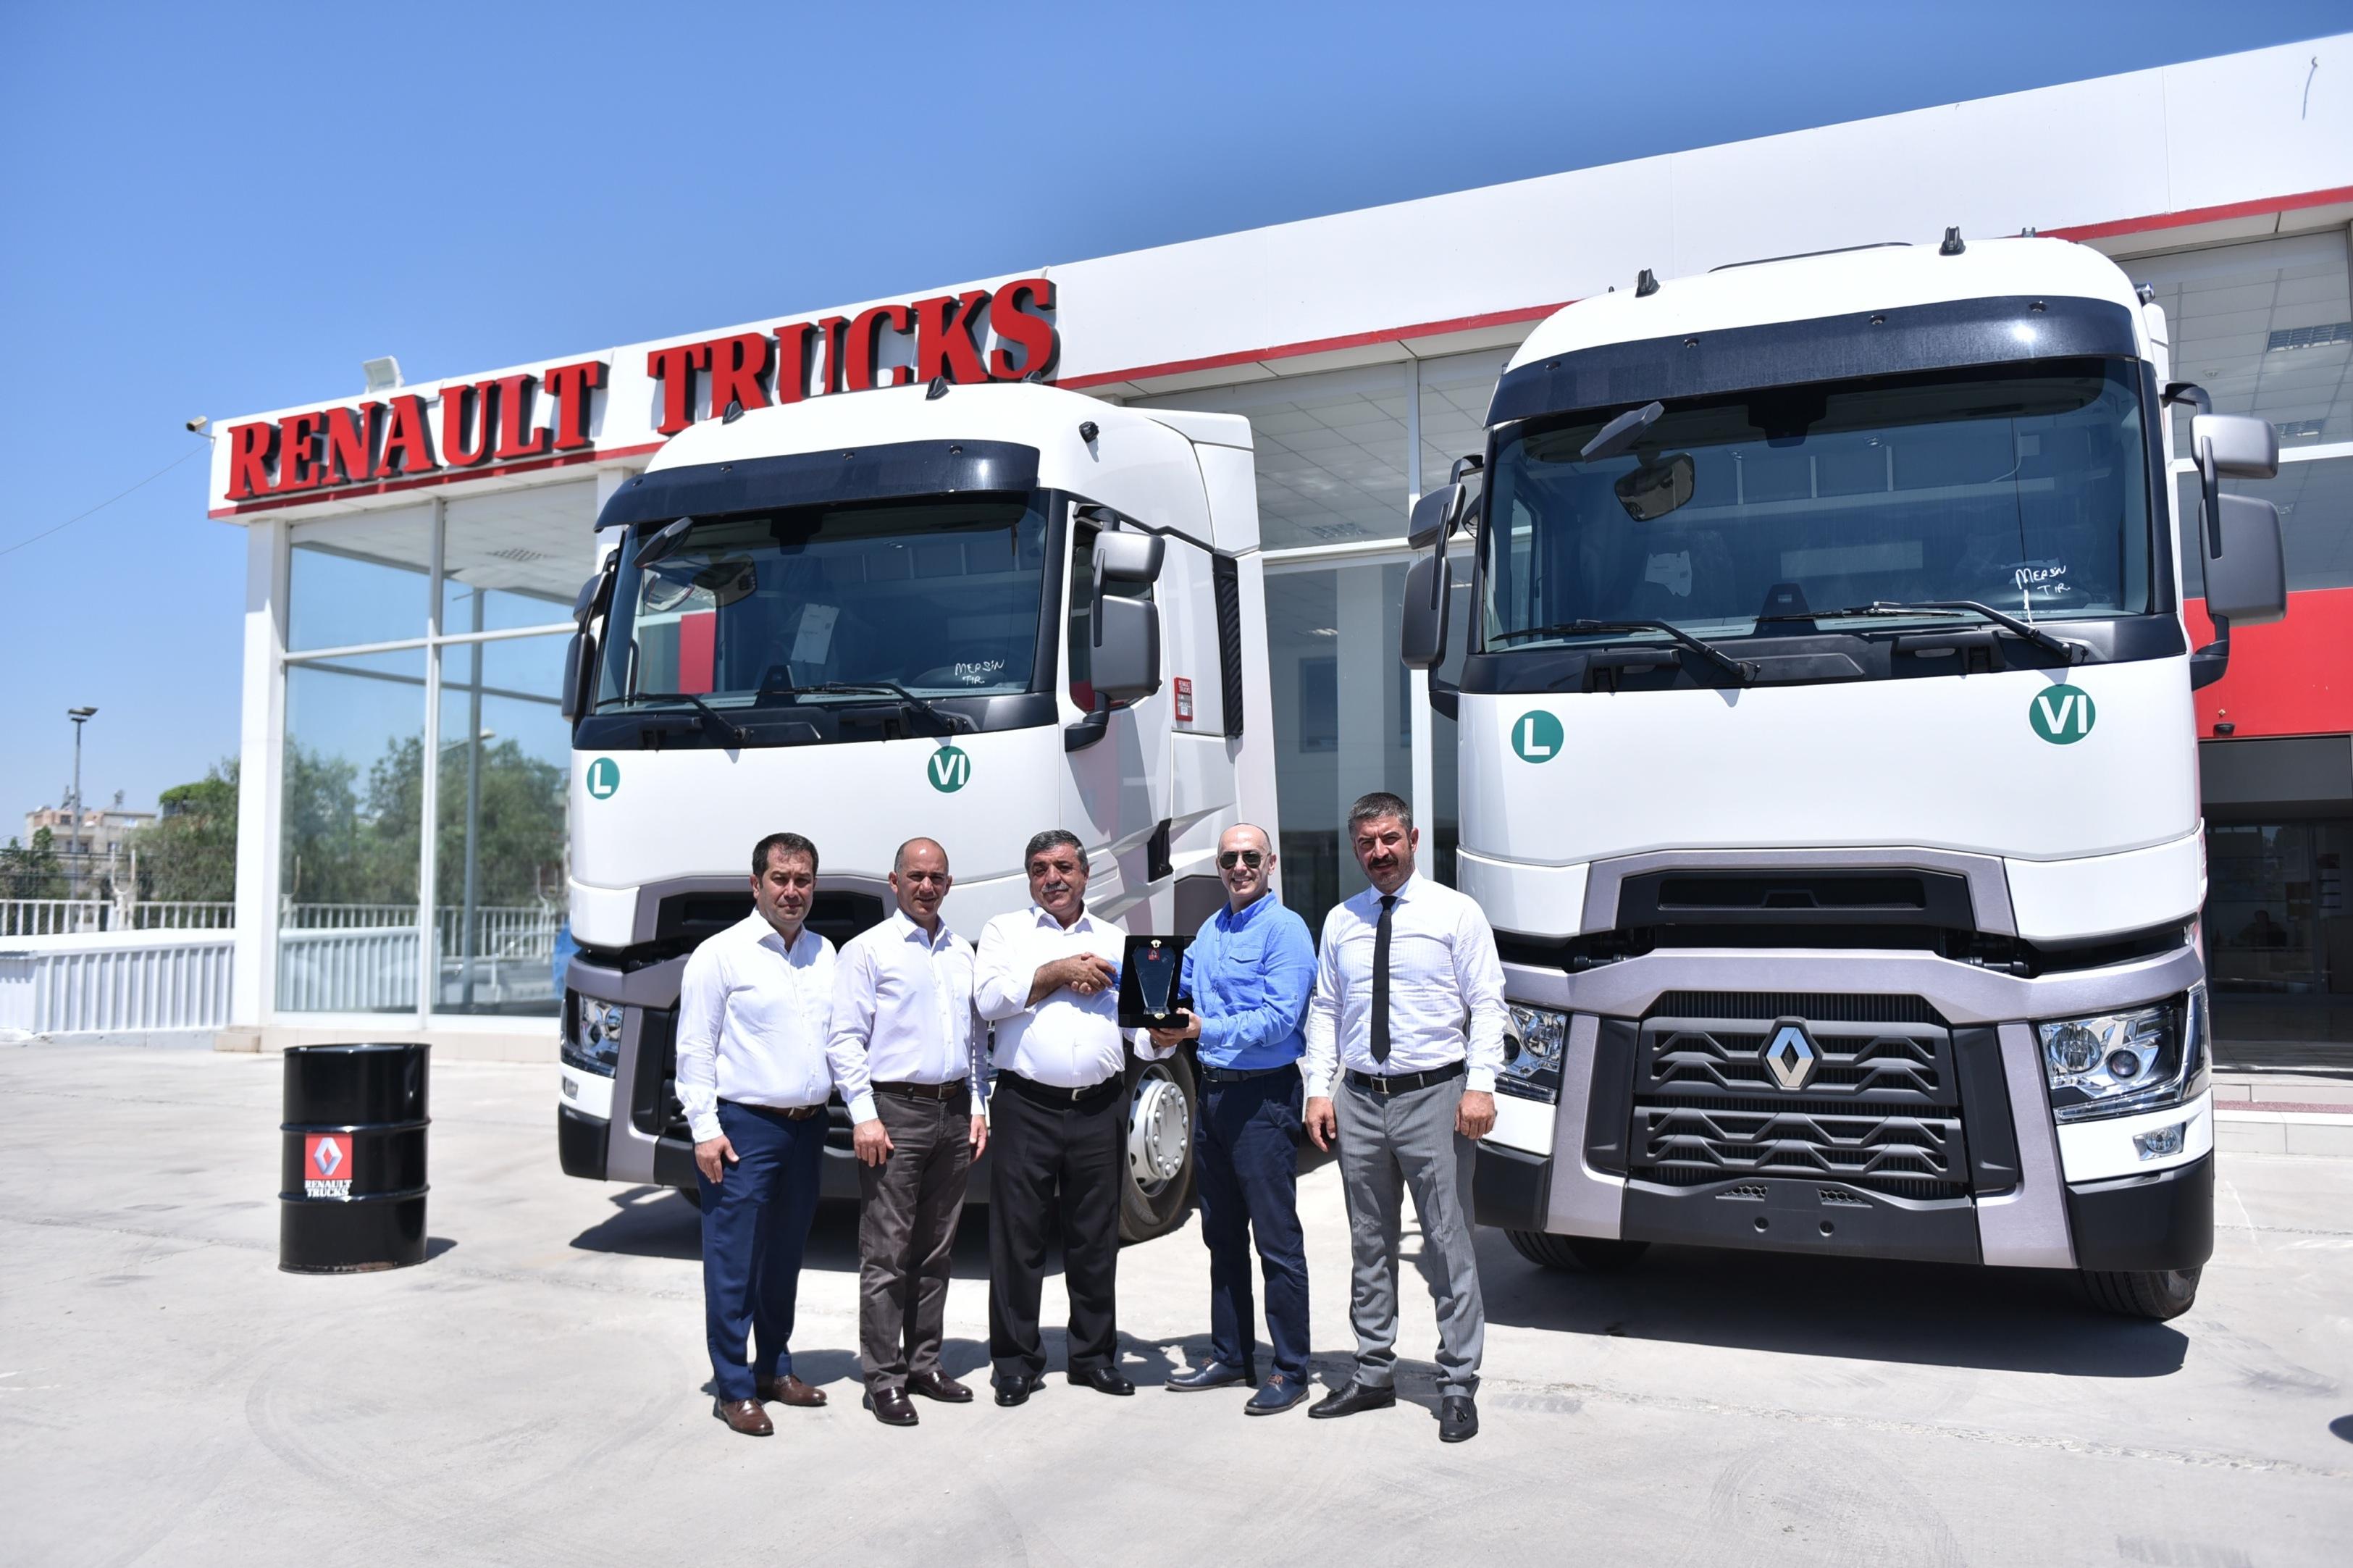 renault-trucks_flay-lojistik_teslimat_gorsel_2.jpg